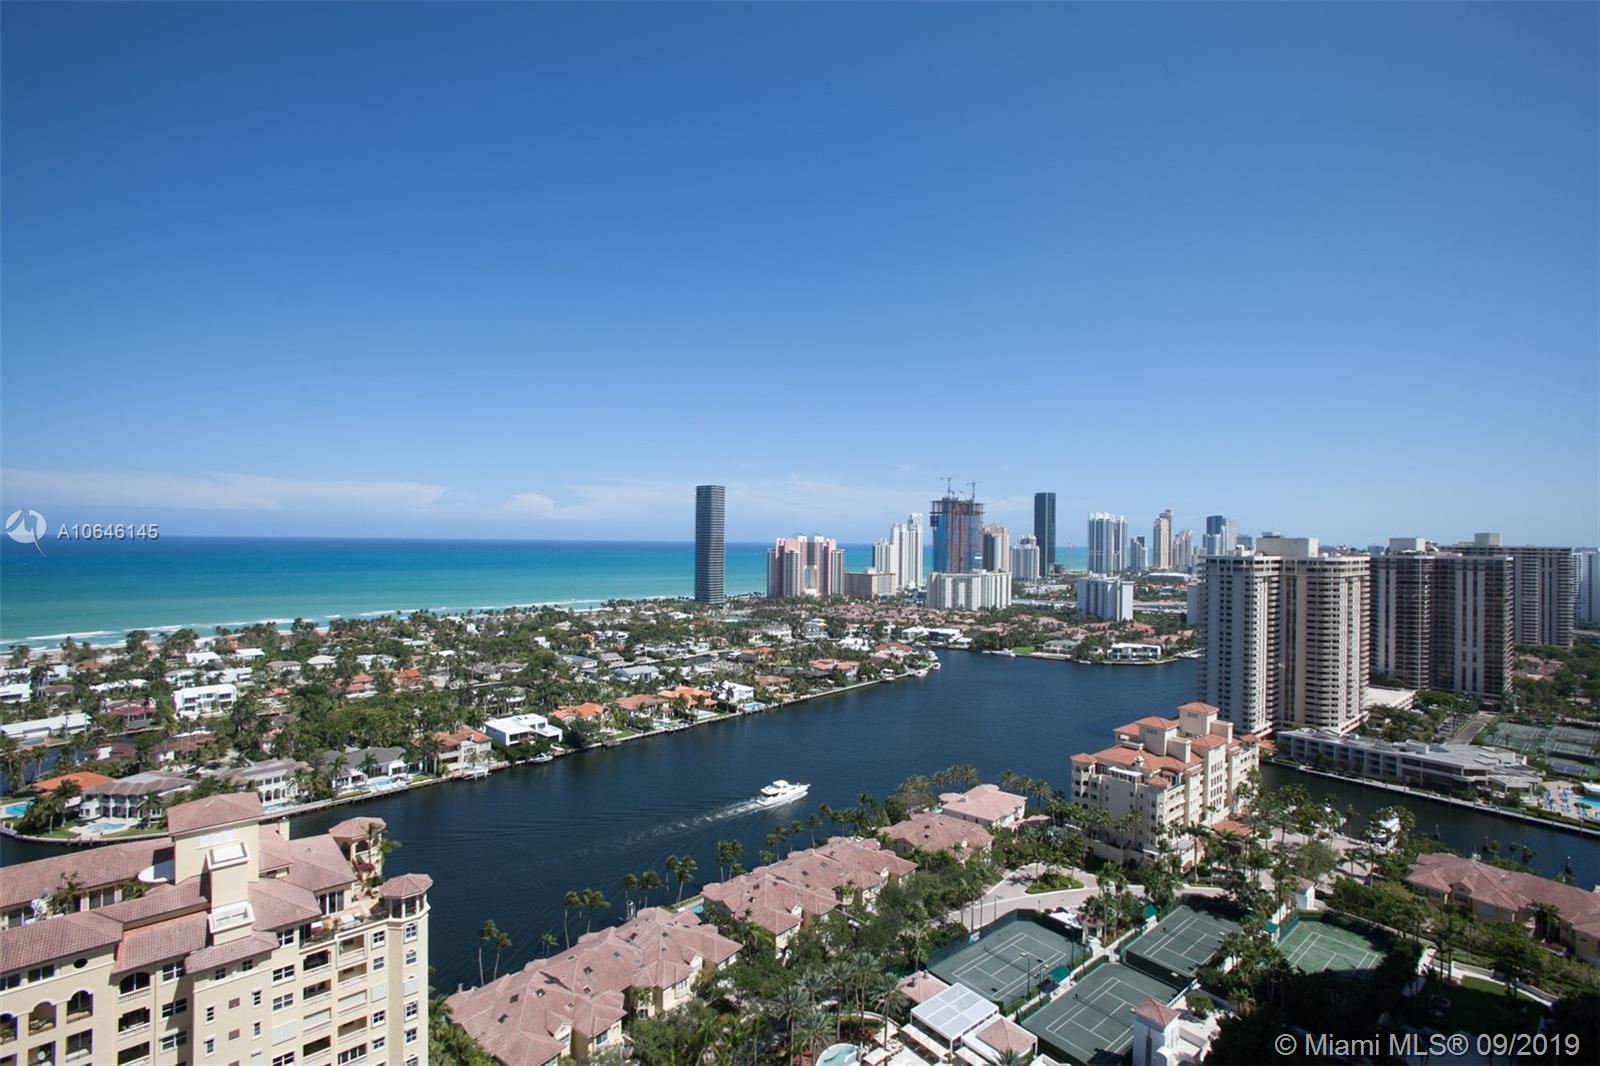 20155 NE 38 CT #1401 Property Photo - Aventura, FL real estate listing